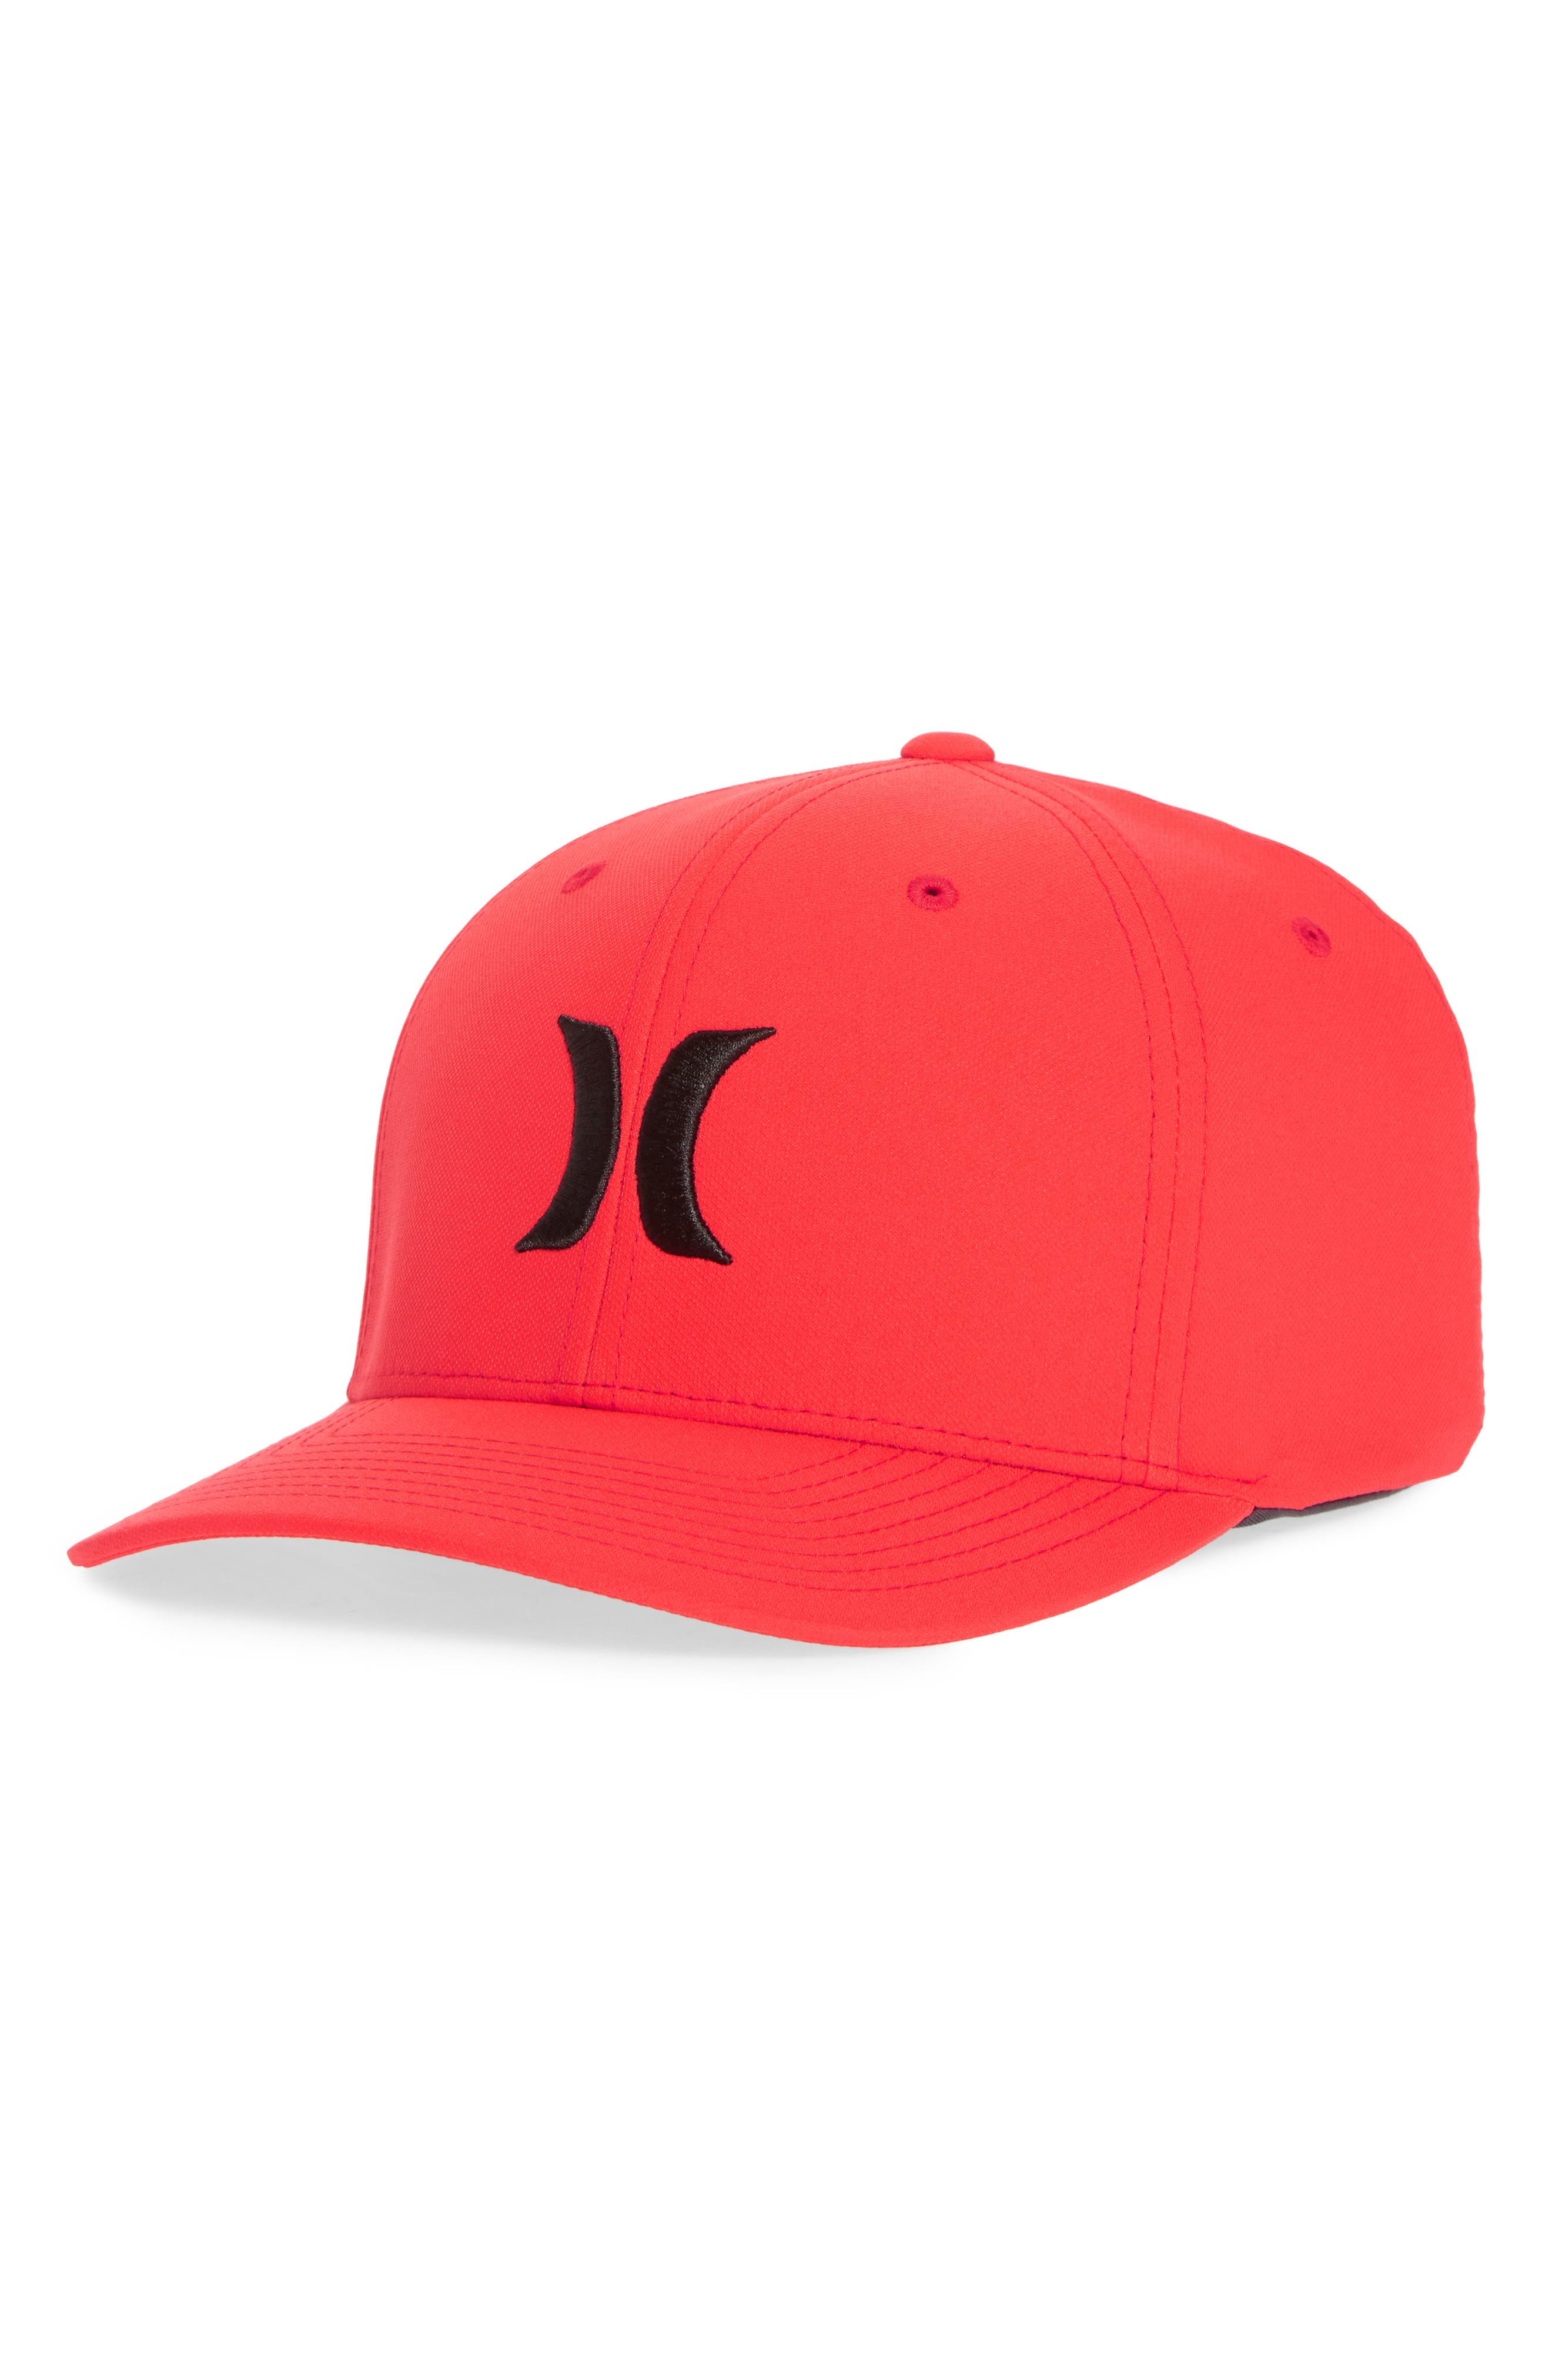 b84b3ea0587 HURLEY DRI-FIT ONE   ONLY LOGO CAP